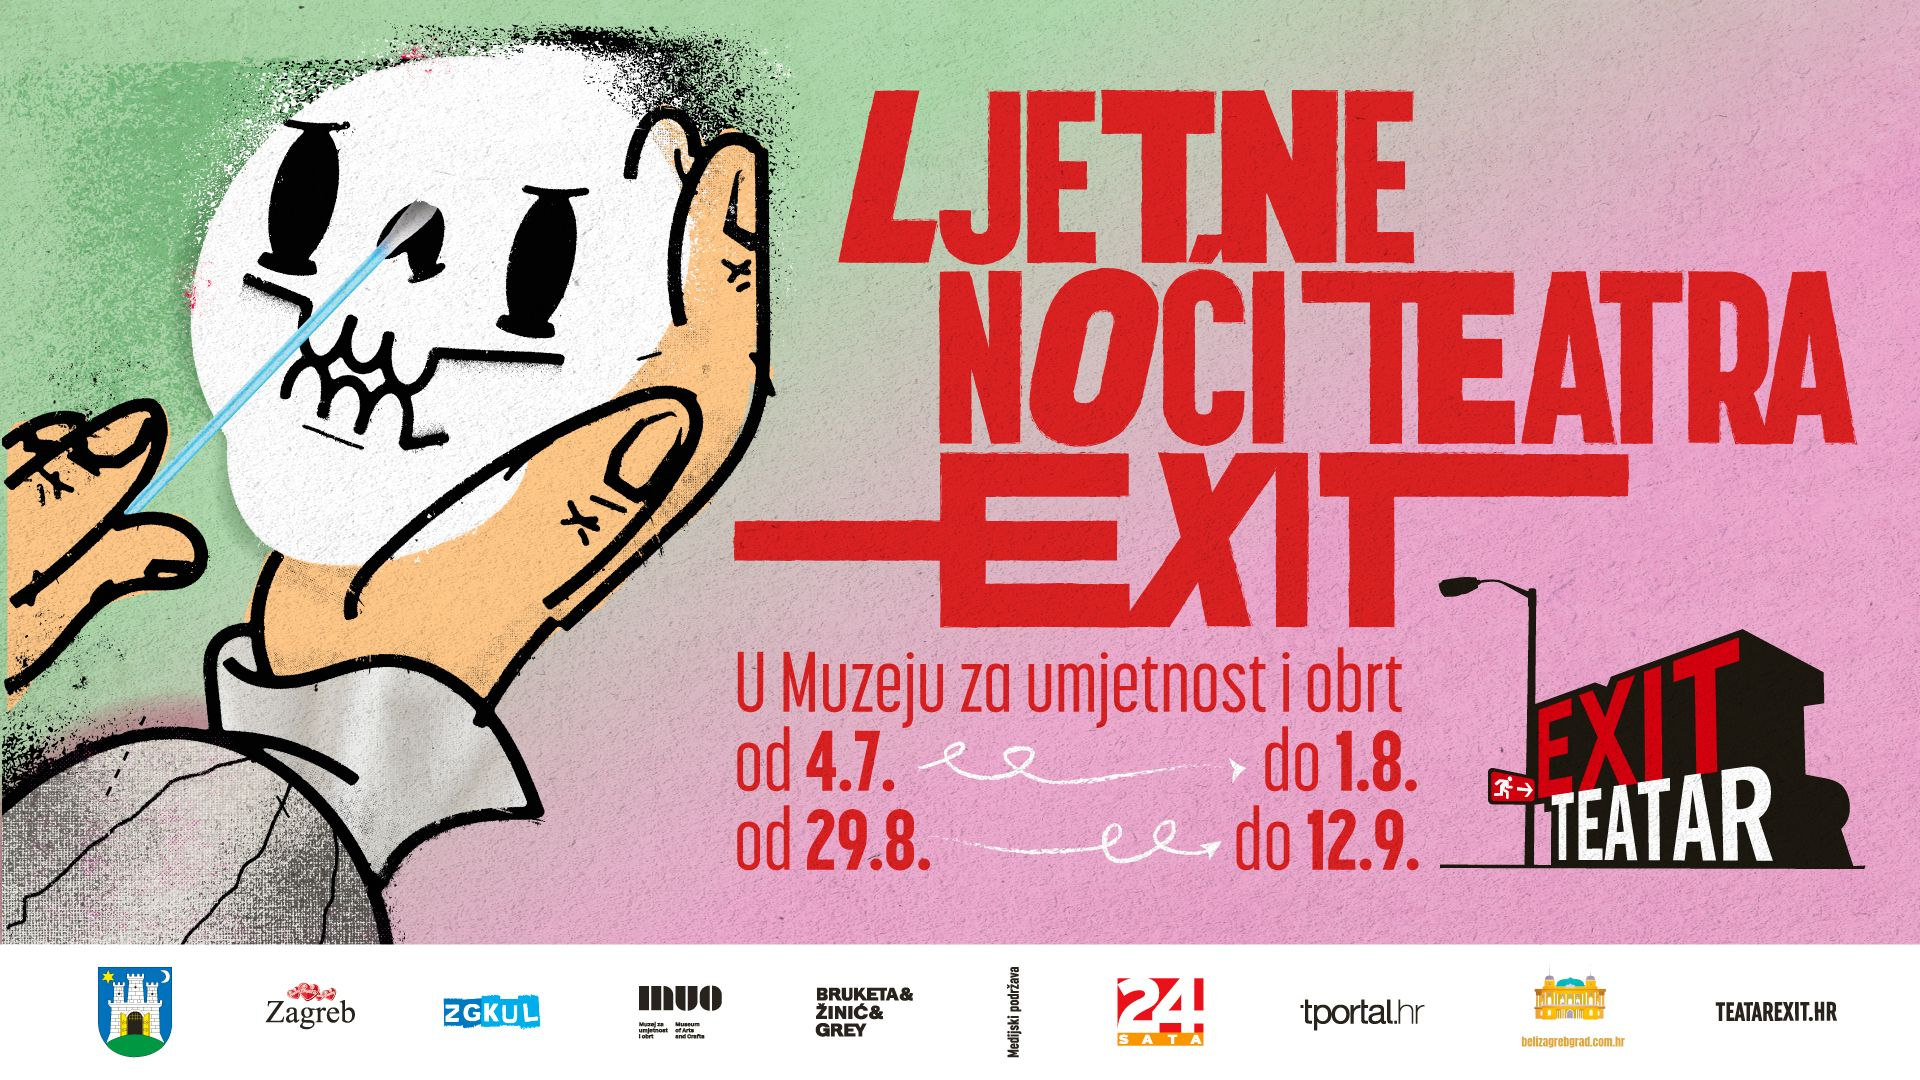 XII. Ljetne noći Teatra EXIT u Muzeju za umjetnost i obrt